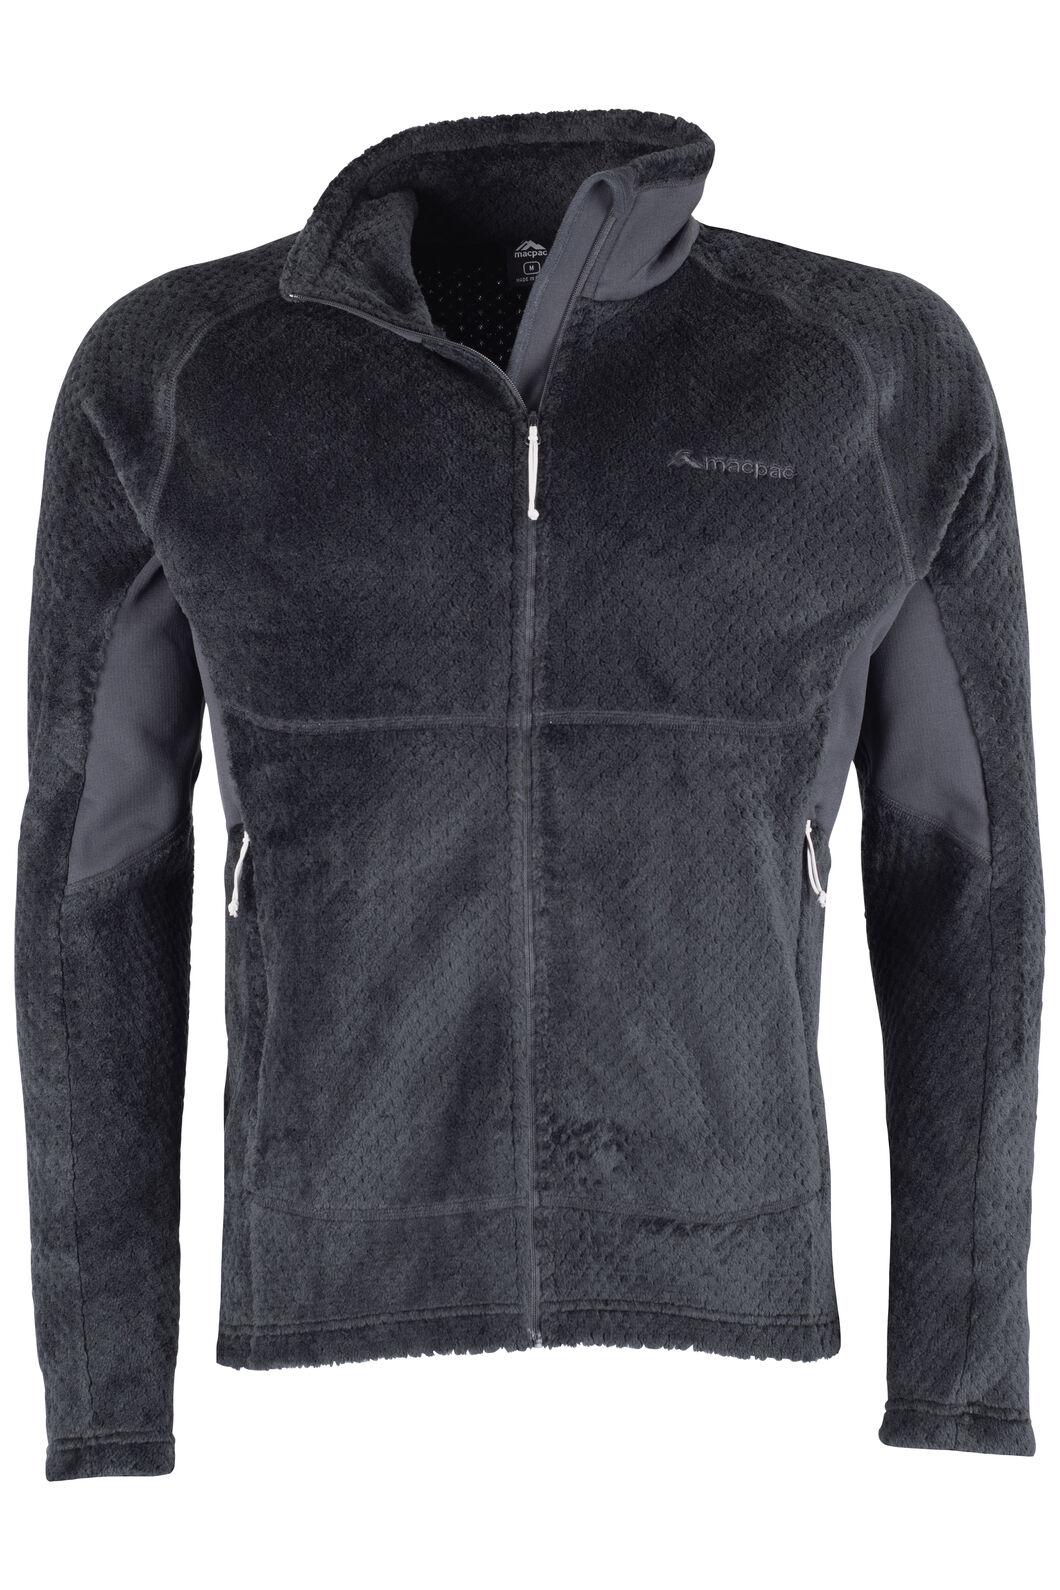 Macpac Pitch Fleece Jacket Mens, Black, hi-res